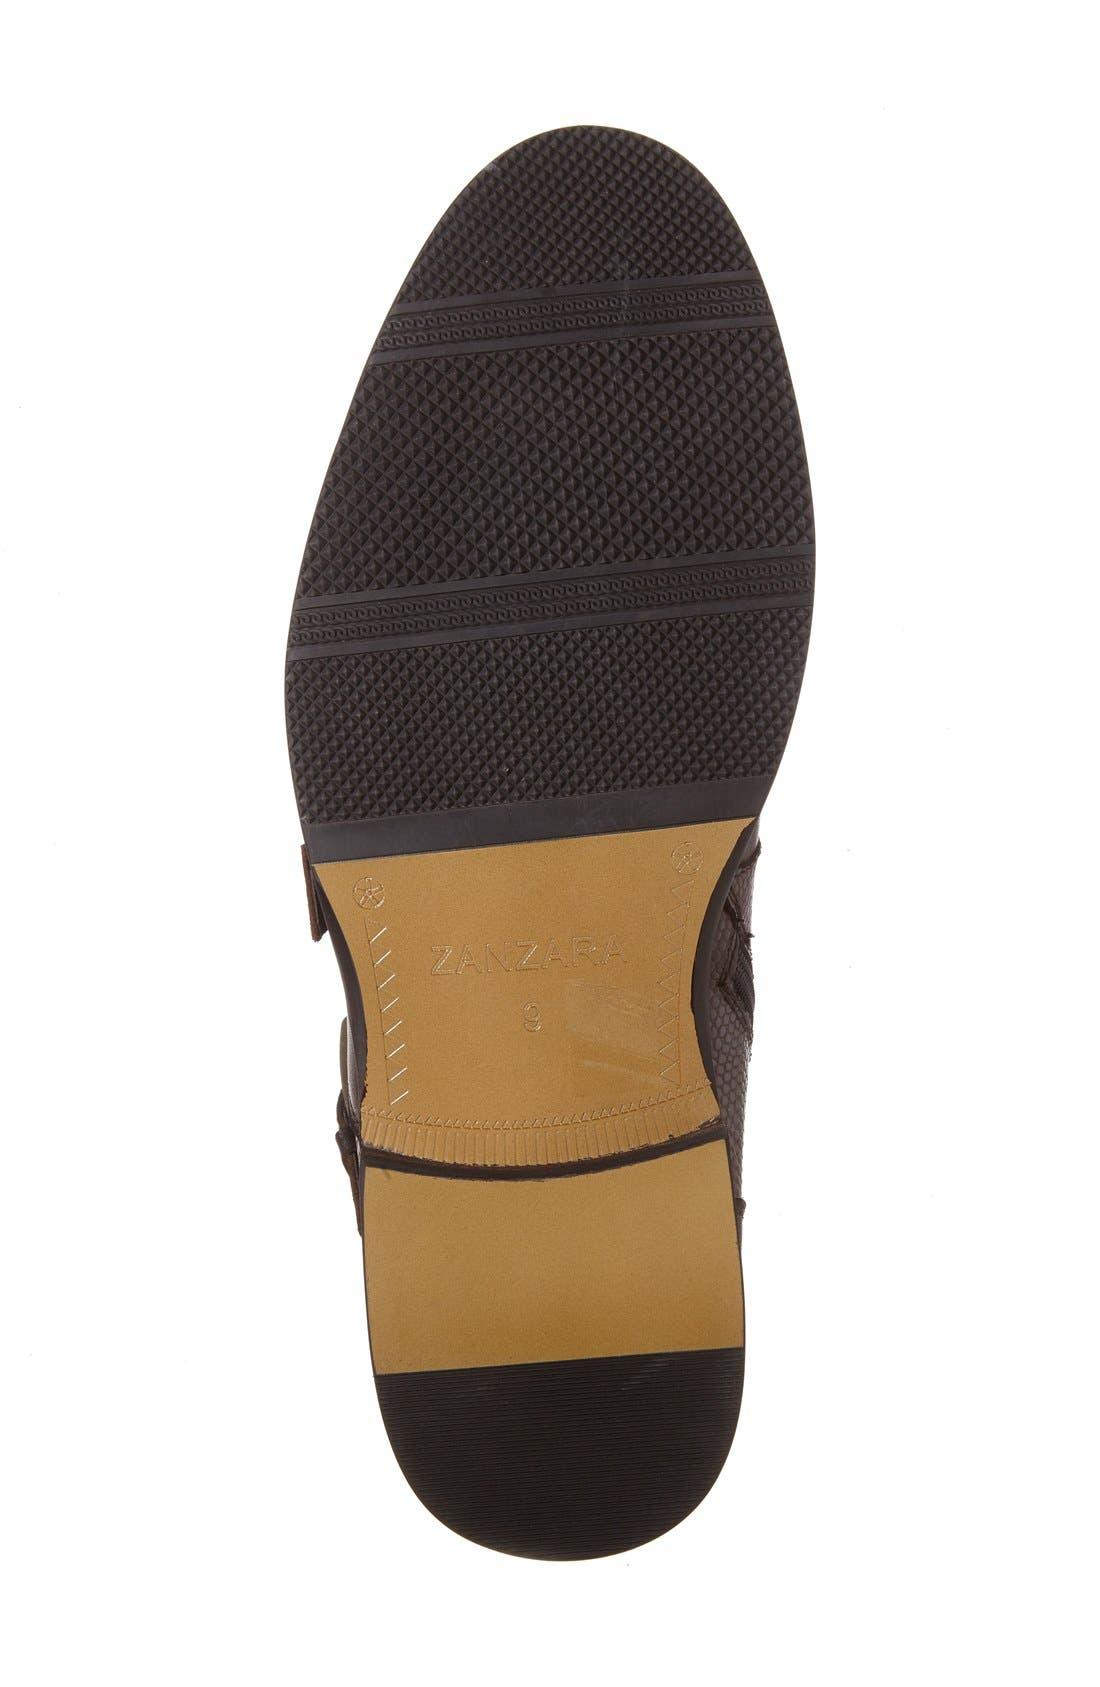 'Messina' Zip Boot,                             Alternate thumbnail 8, color,